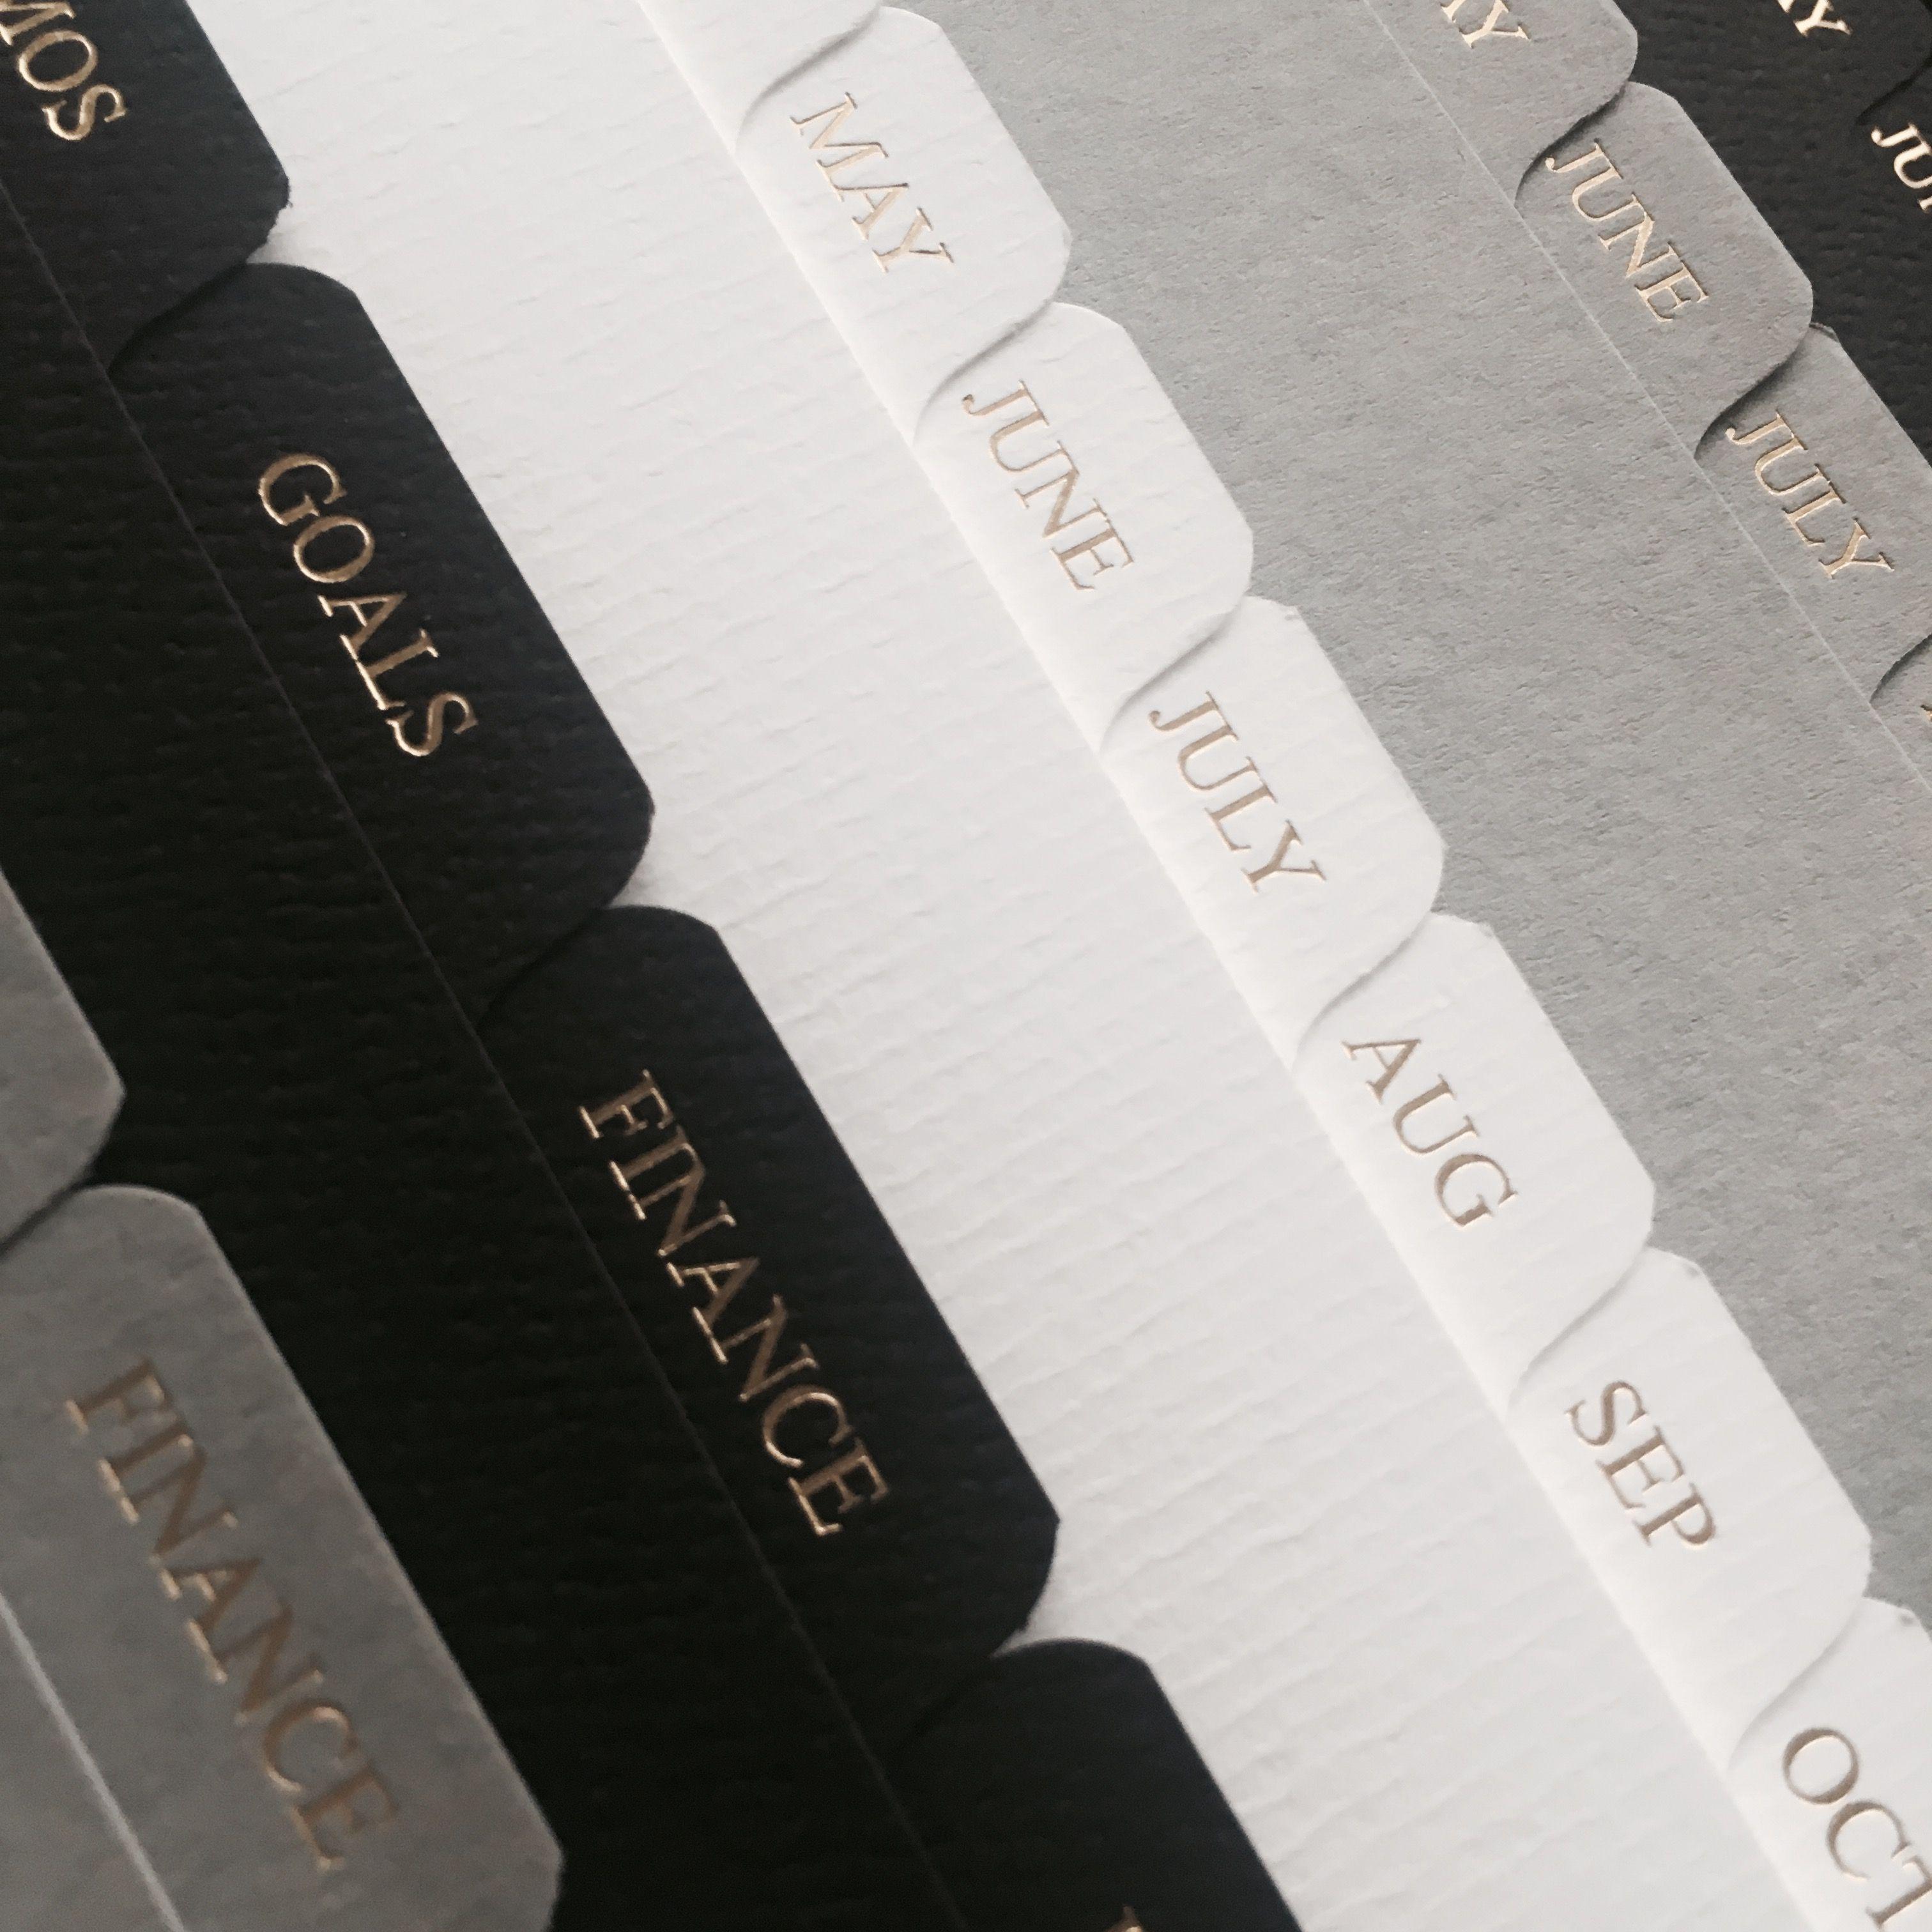 Luxury Planner  Agenda Dividers For Louis Vuitton Agenda  Books